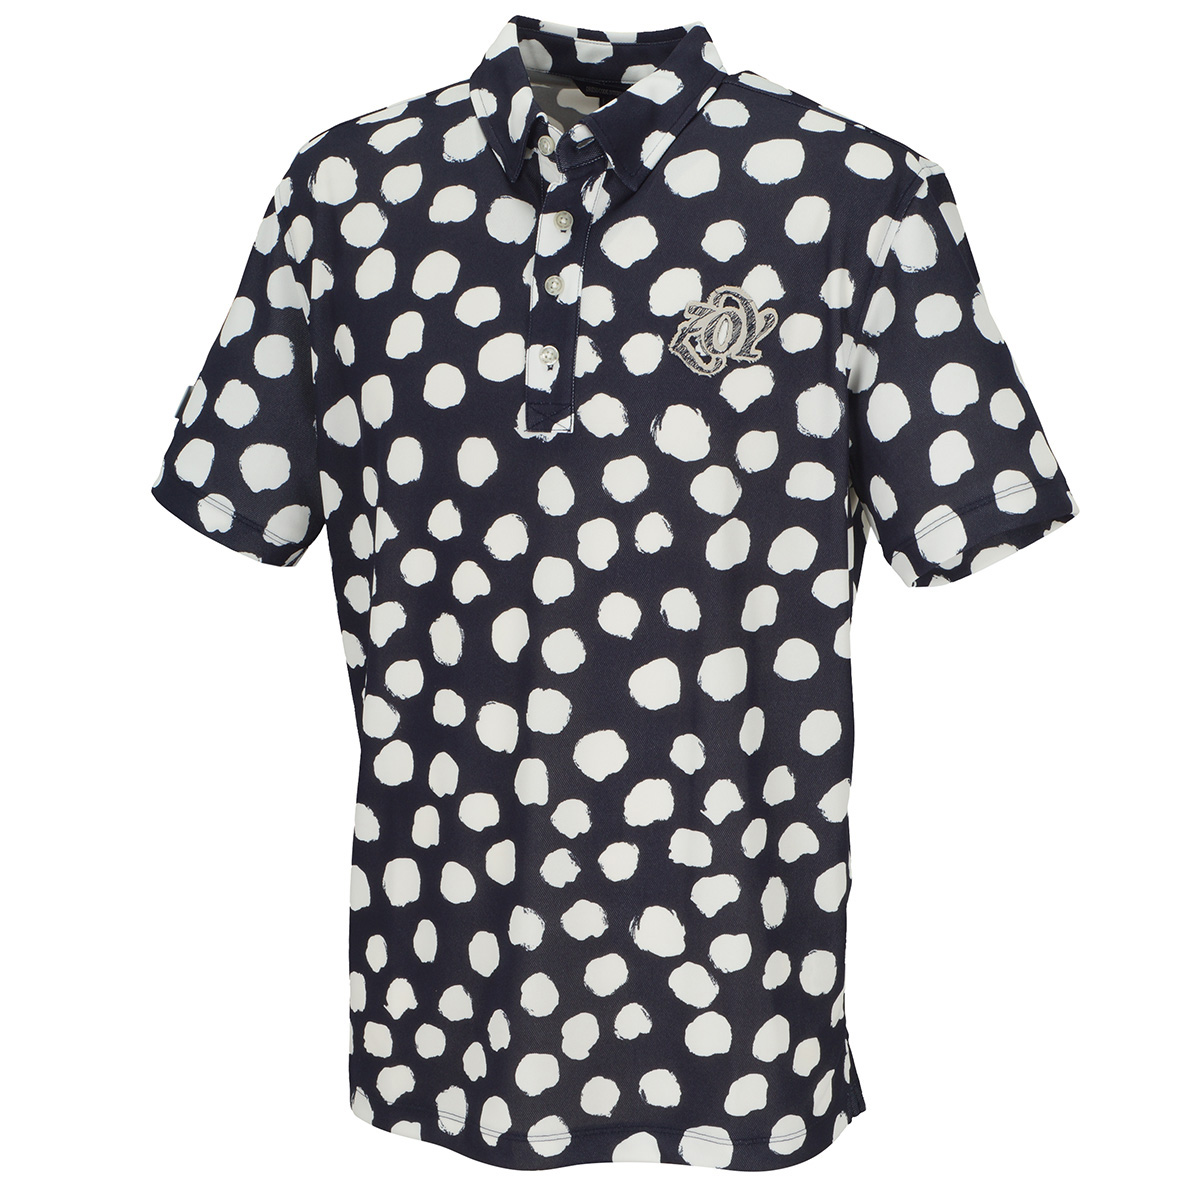 JAMSドットプリント 半袖ポロシャツ